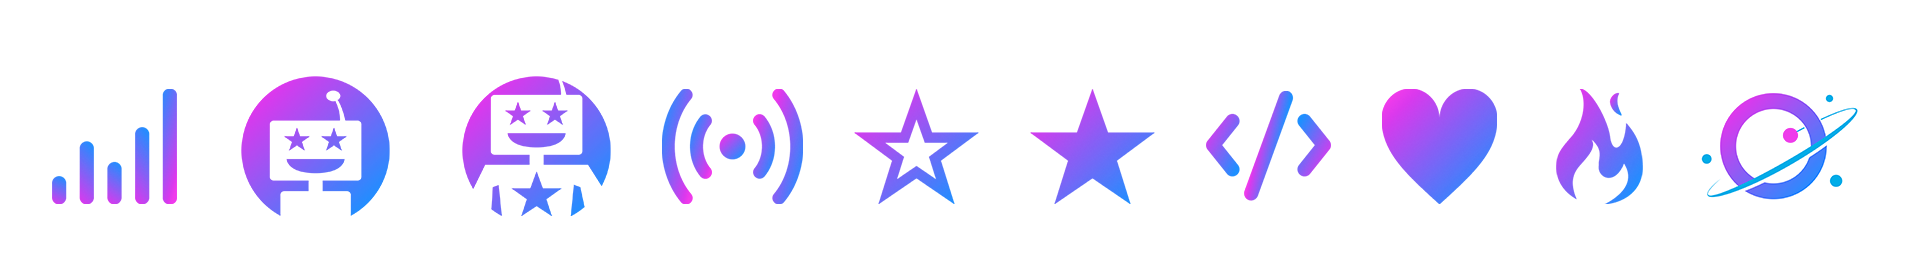 Orbit Custom Emoji